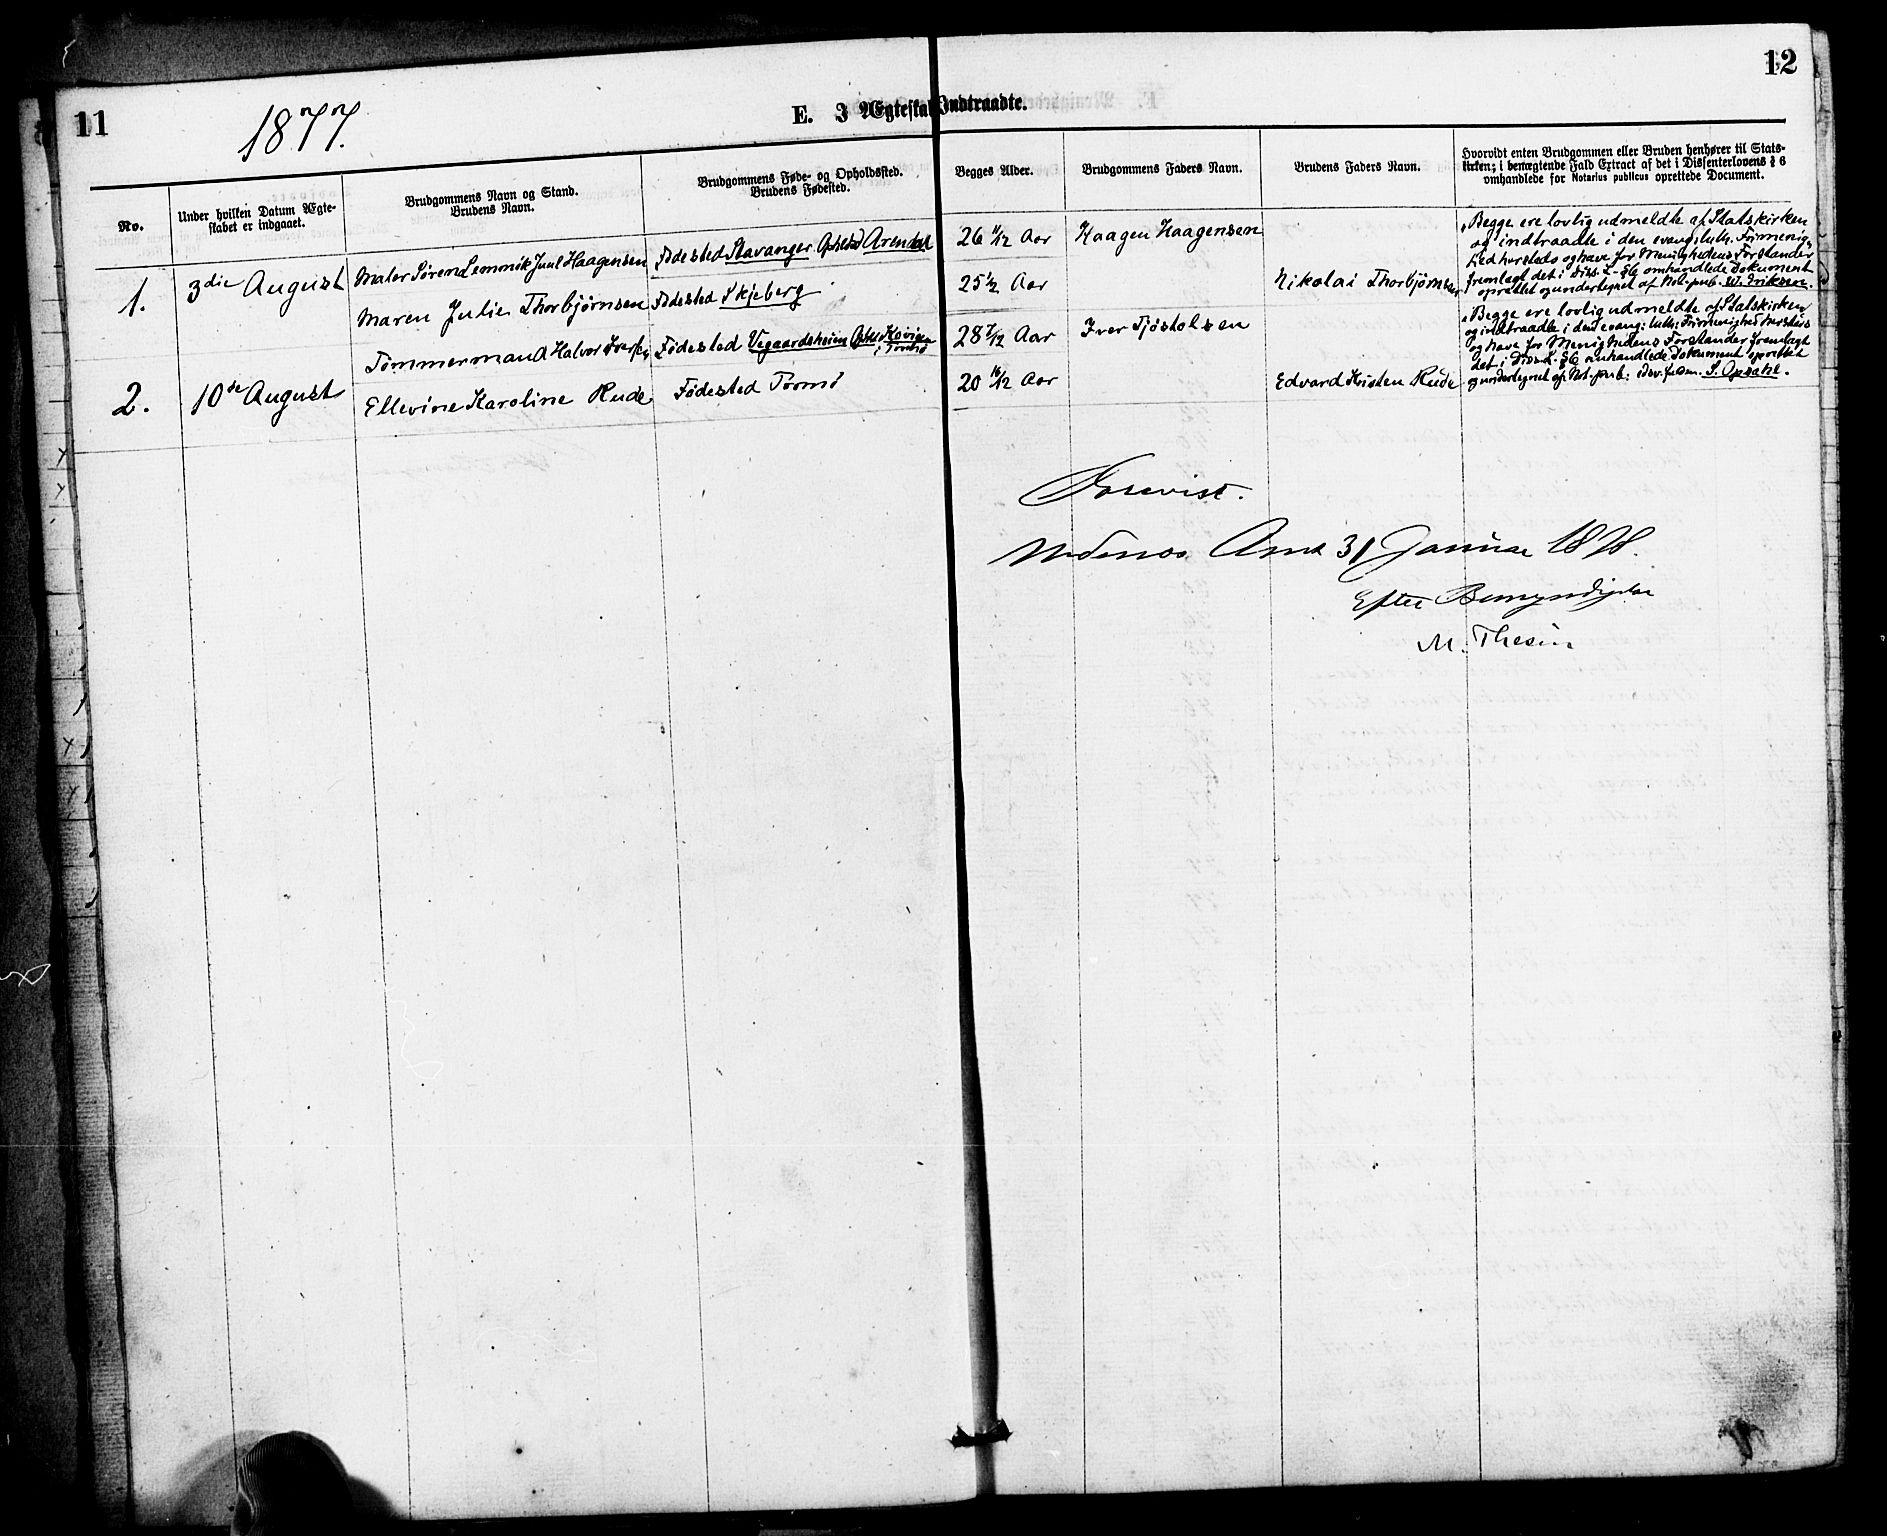 SAK, Den evangelisk-lutherske frimenighet, Arendal, F/Fa/L0001: Dissenterprotokoll nr. F 5, 1877-1883, s. 11-12